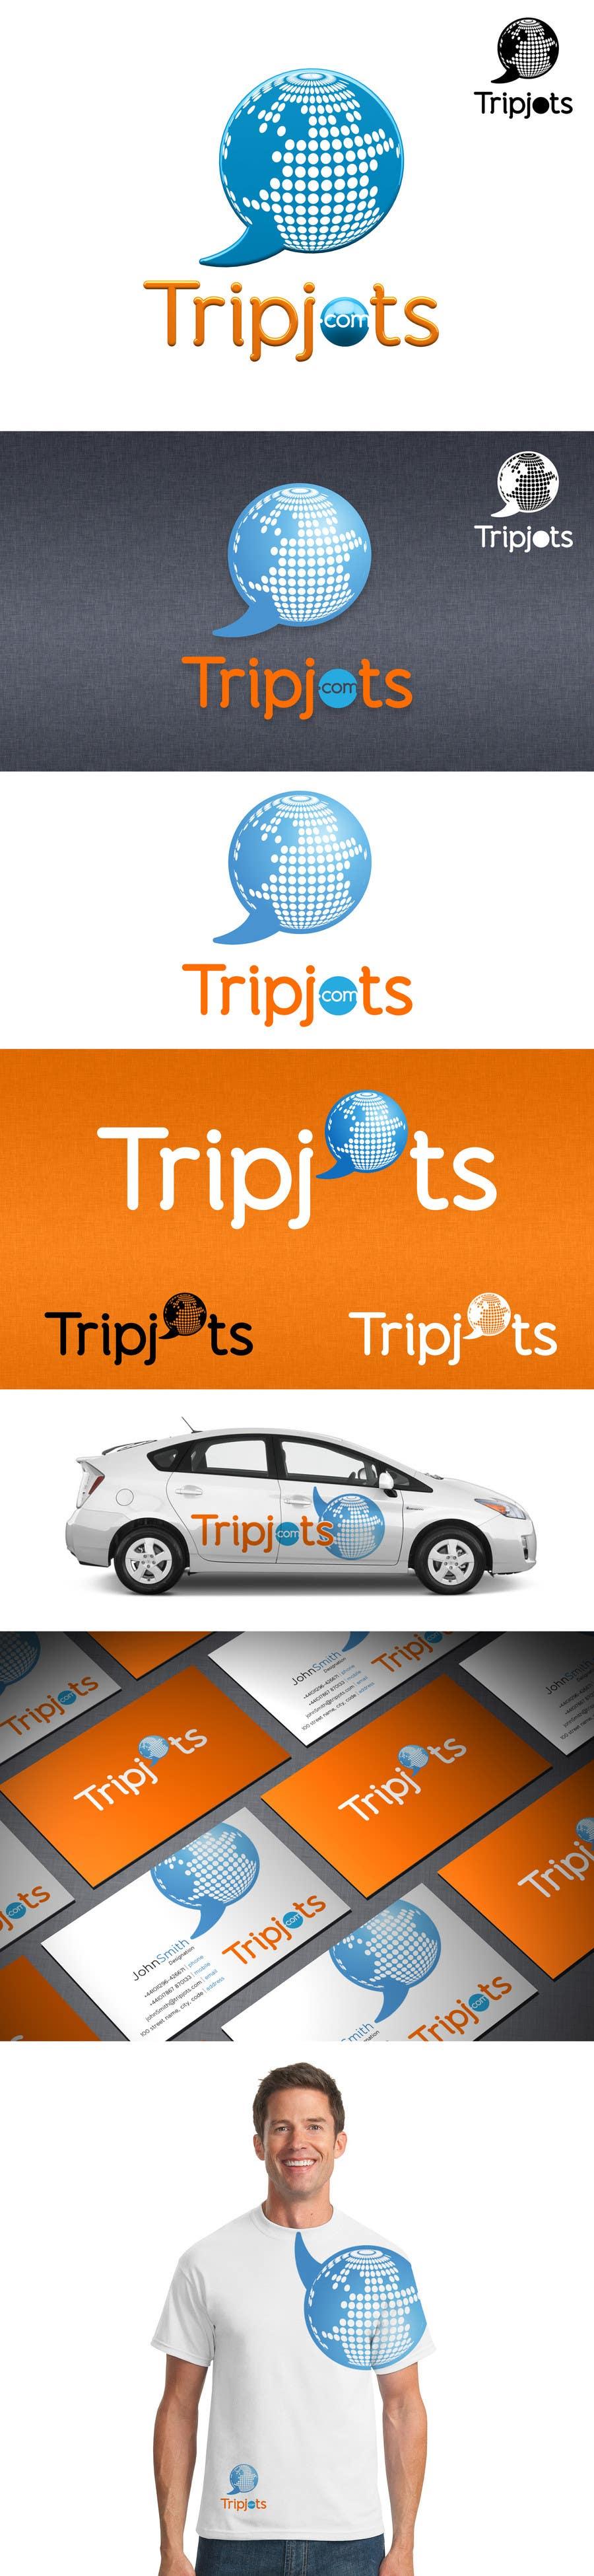 #51 for Design a Logo for Travel Website by HallidayBooks